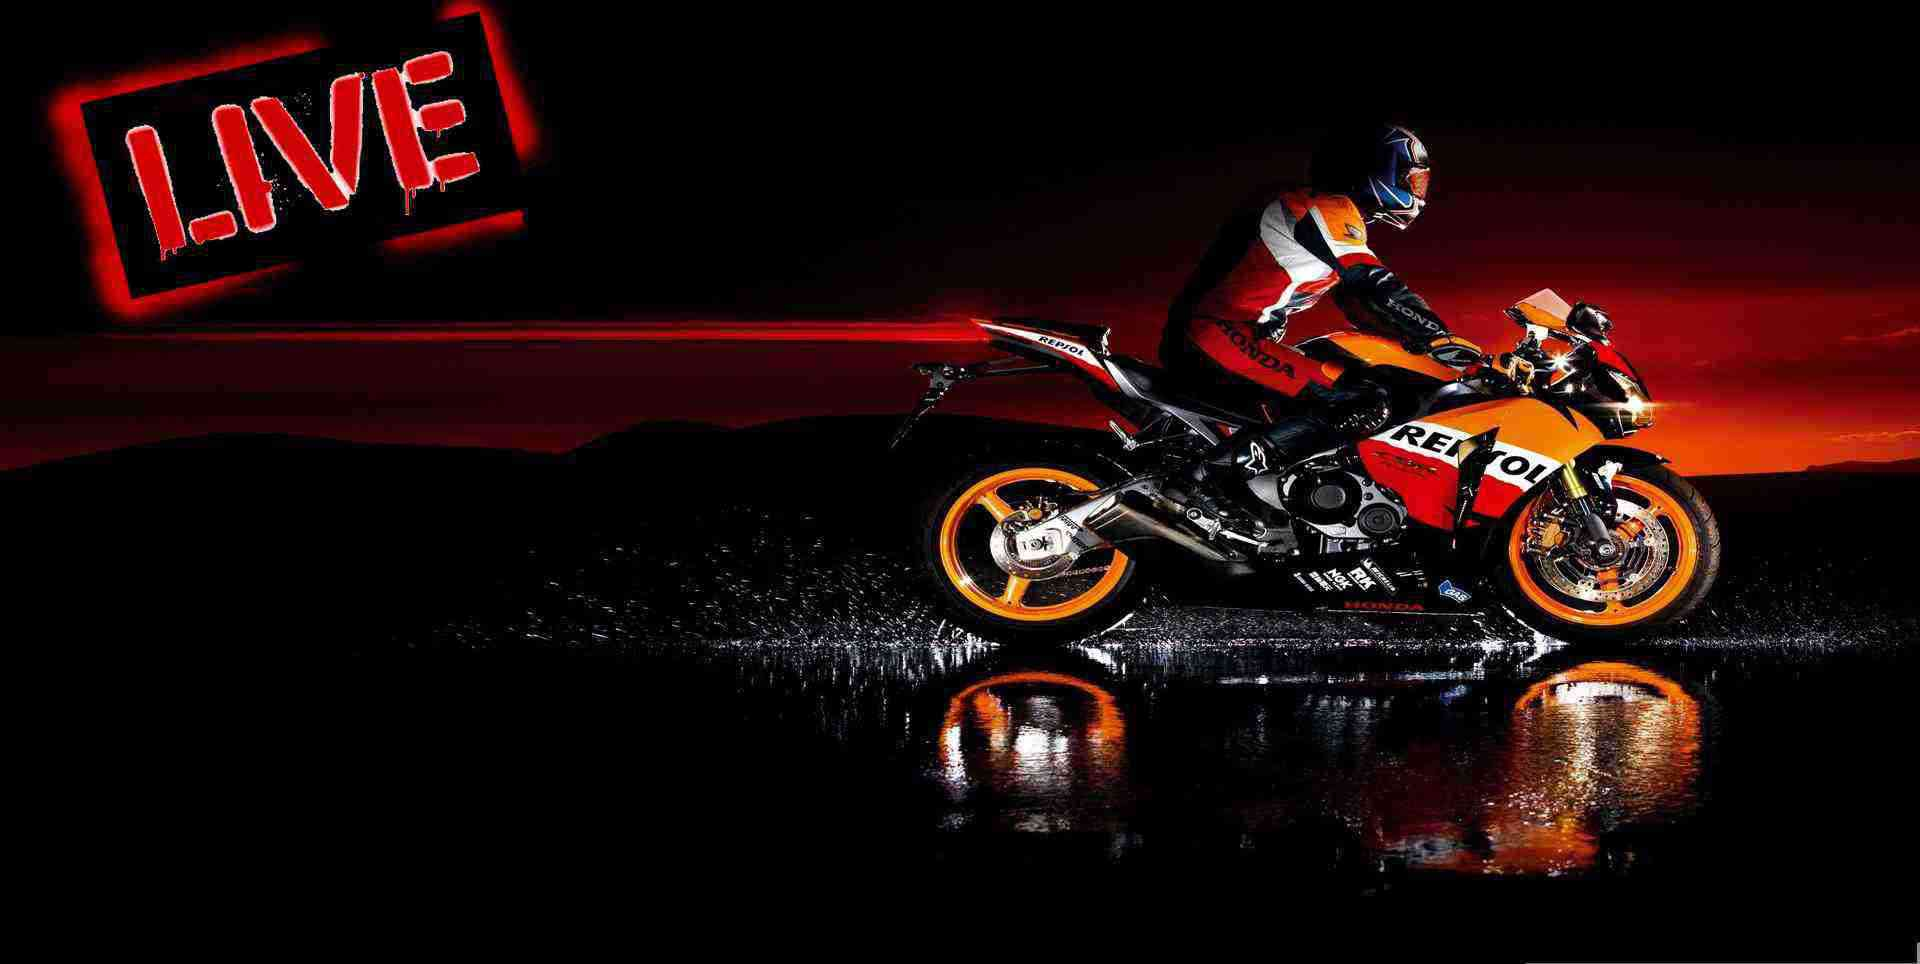 motogp-netherlands-grand-prix-online-stream